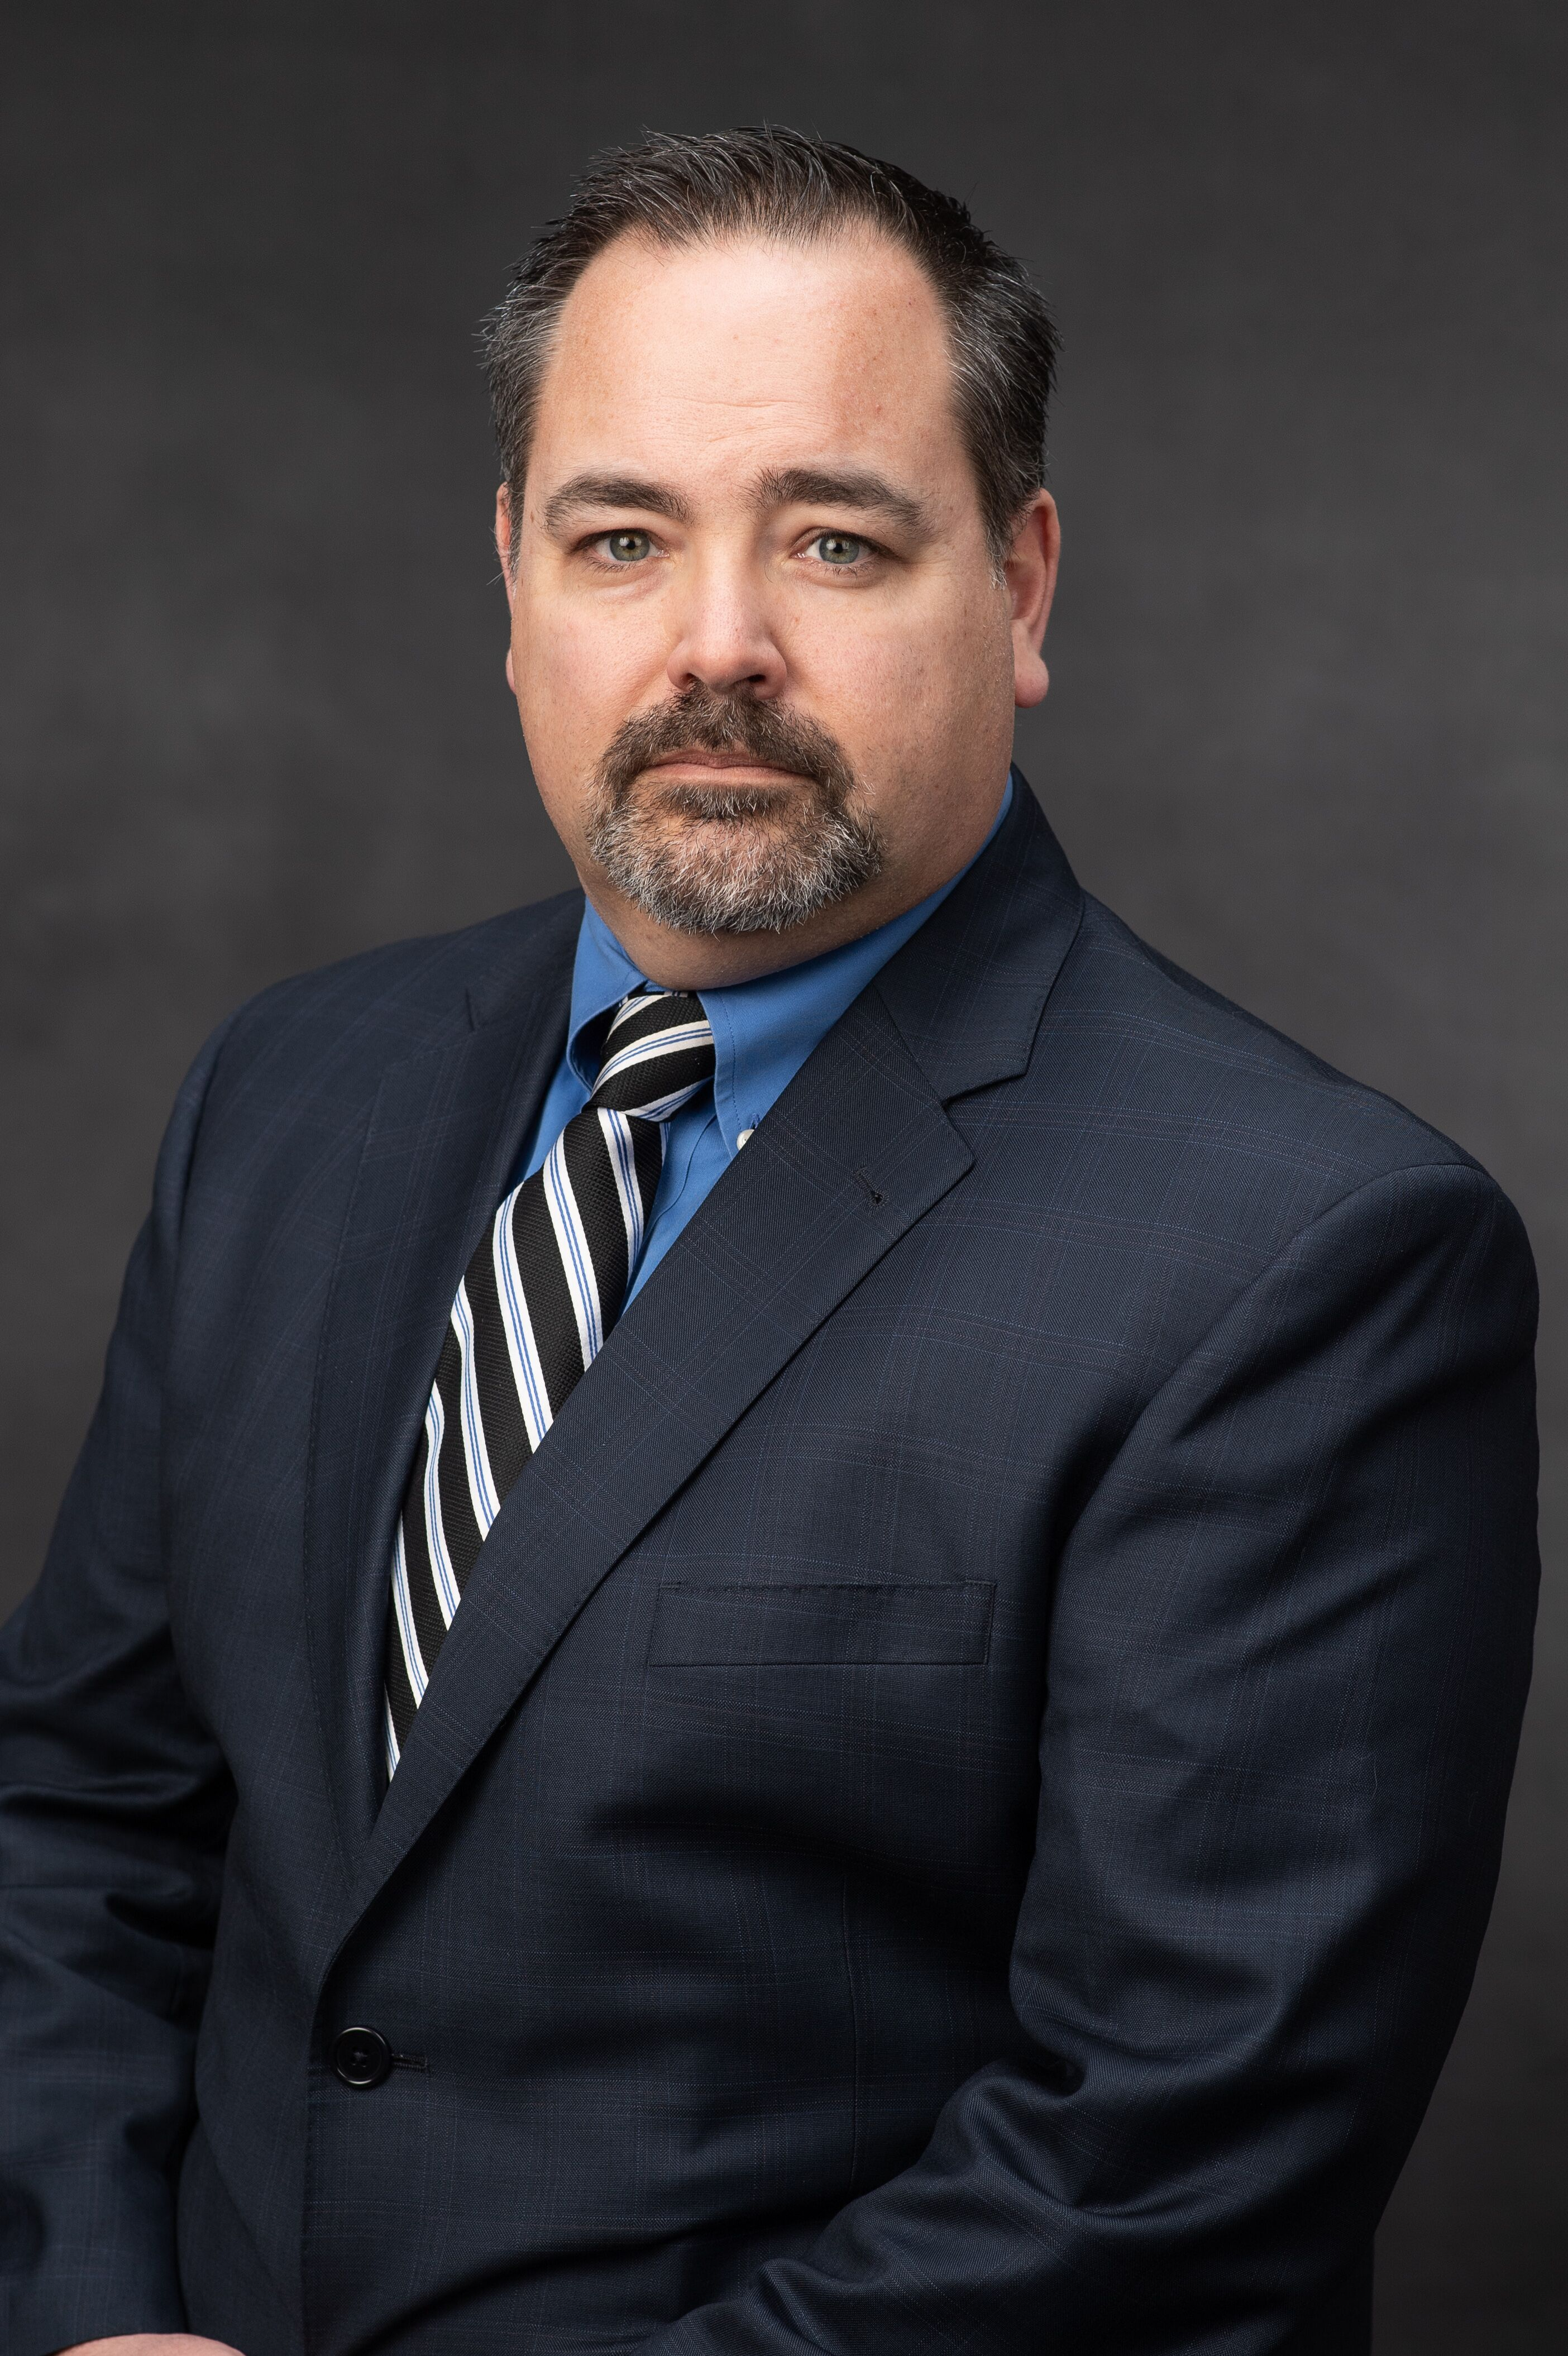 Dennis J. De Kok CFP, CDFA